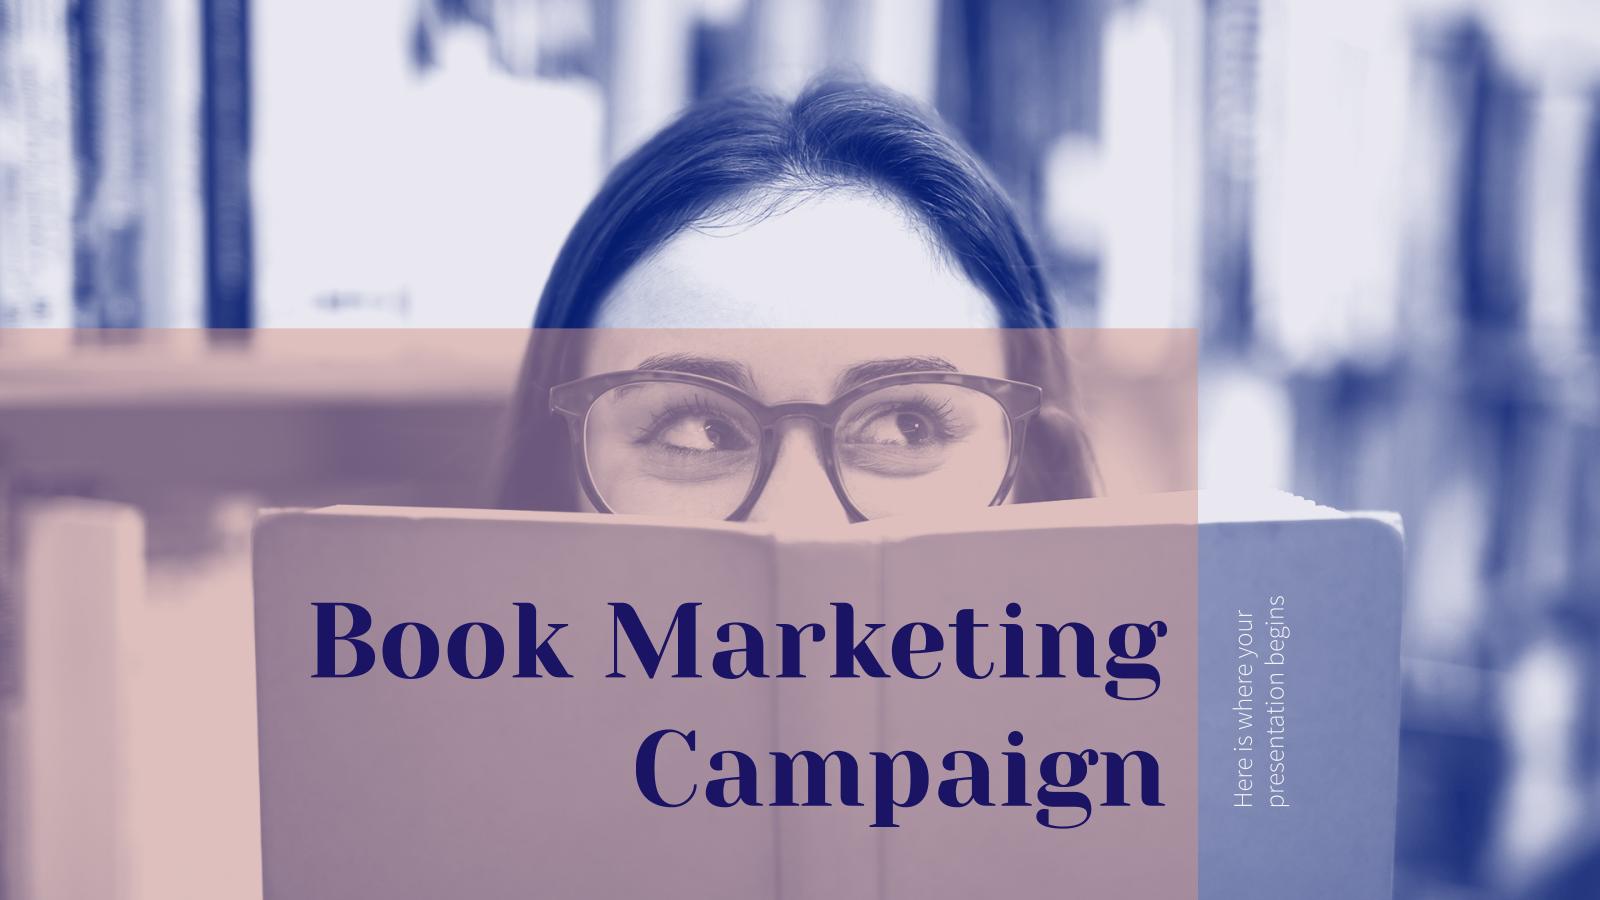 Book Marketing Campaign presentation template